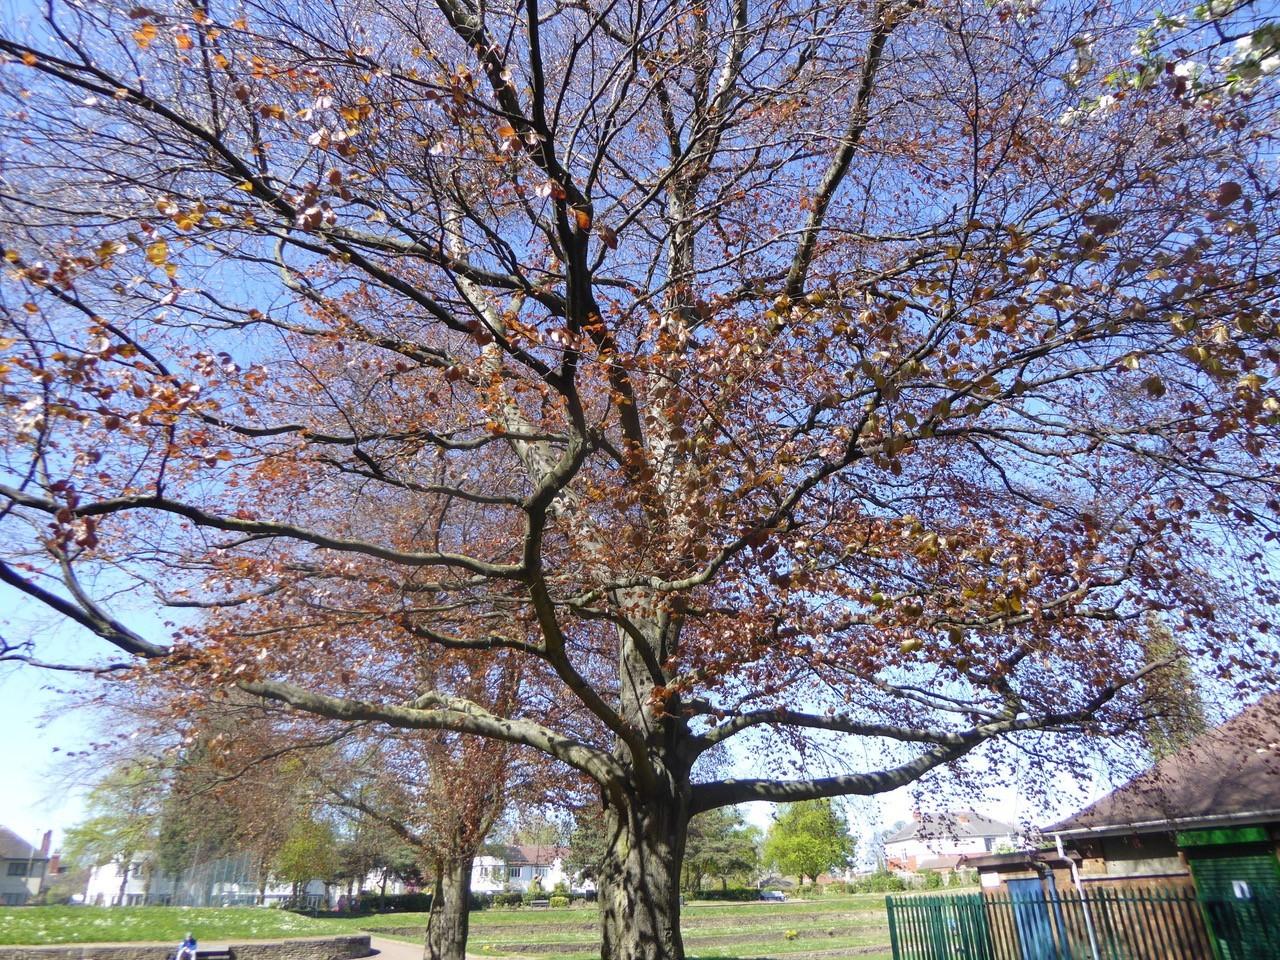 Copper Beech (Fagus sylvatica f purpurea), Grove Park, Doncaster